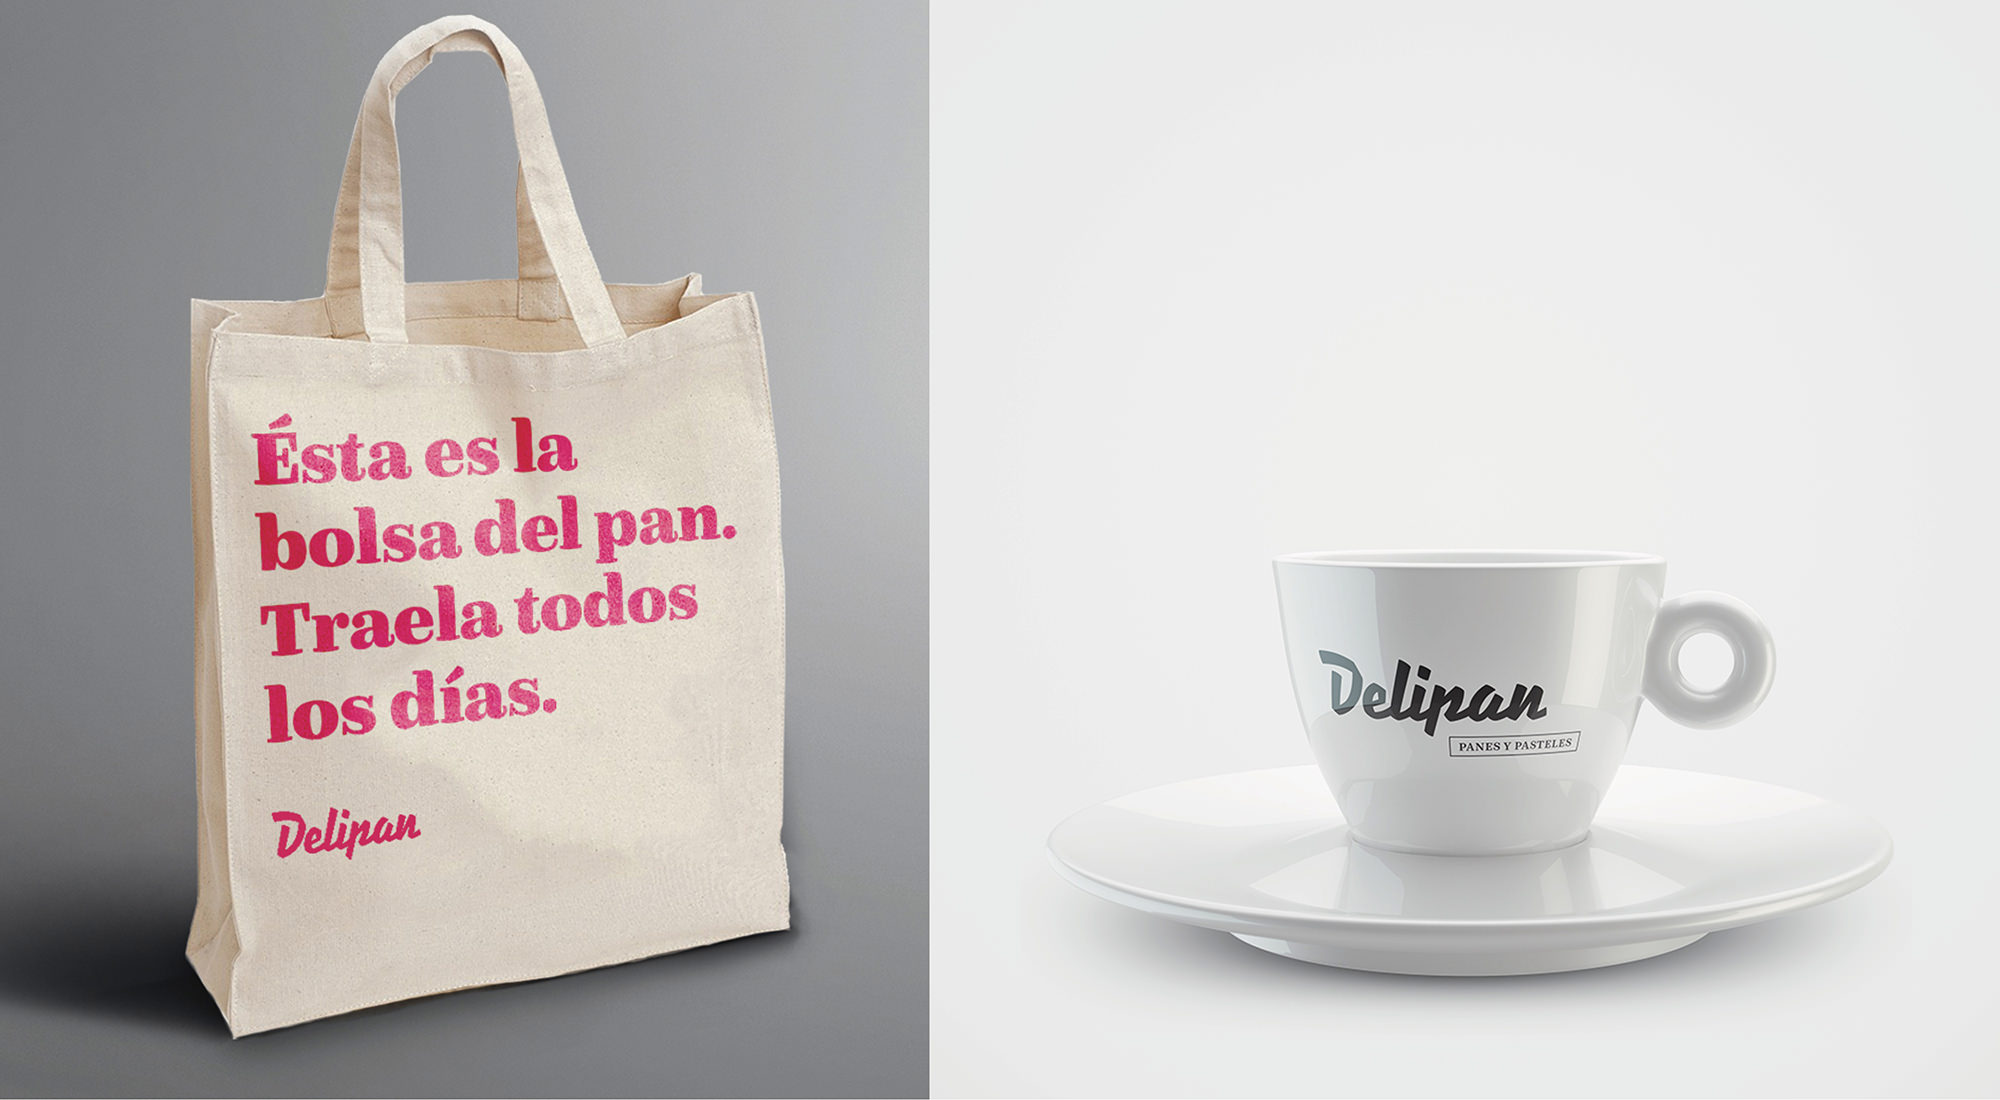 Delipan